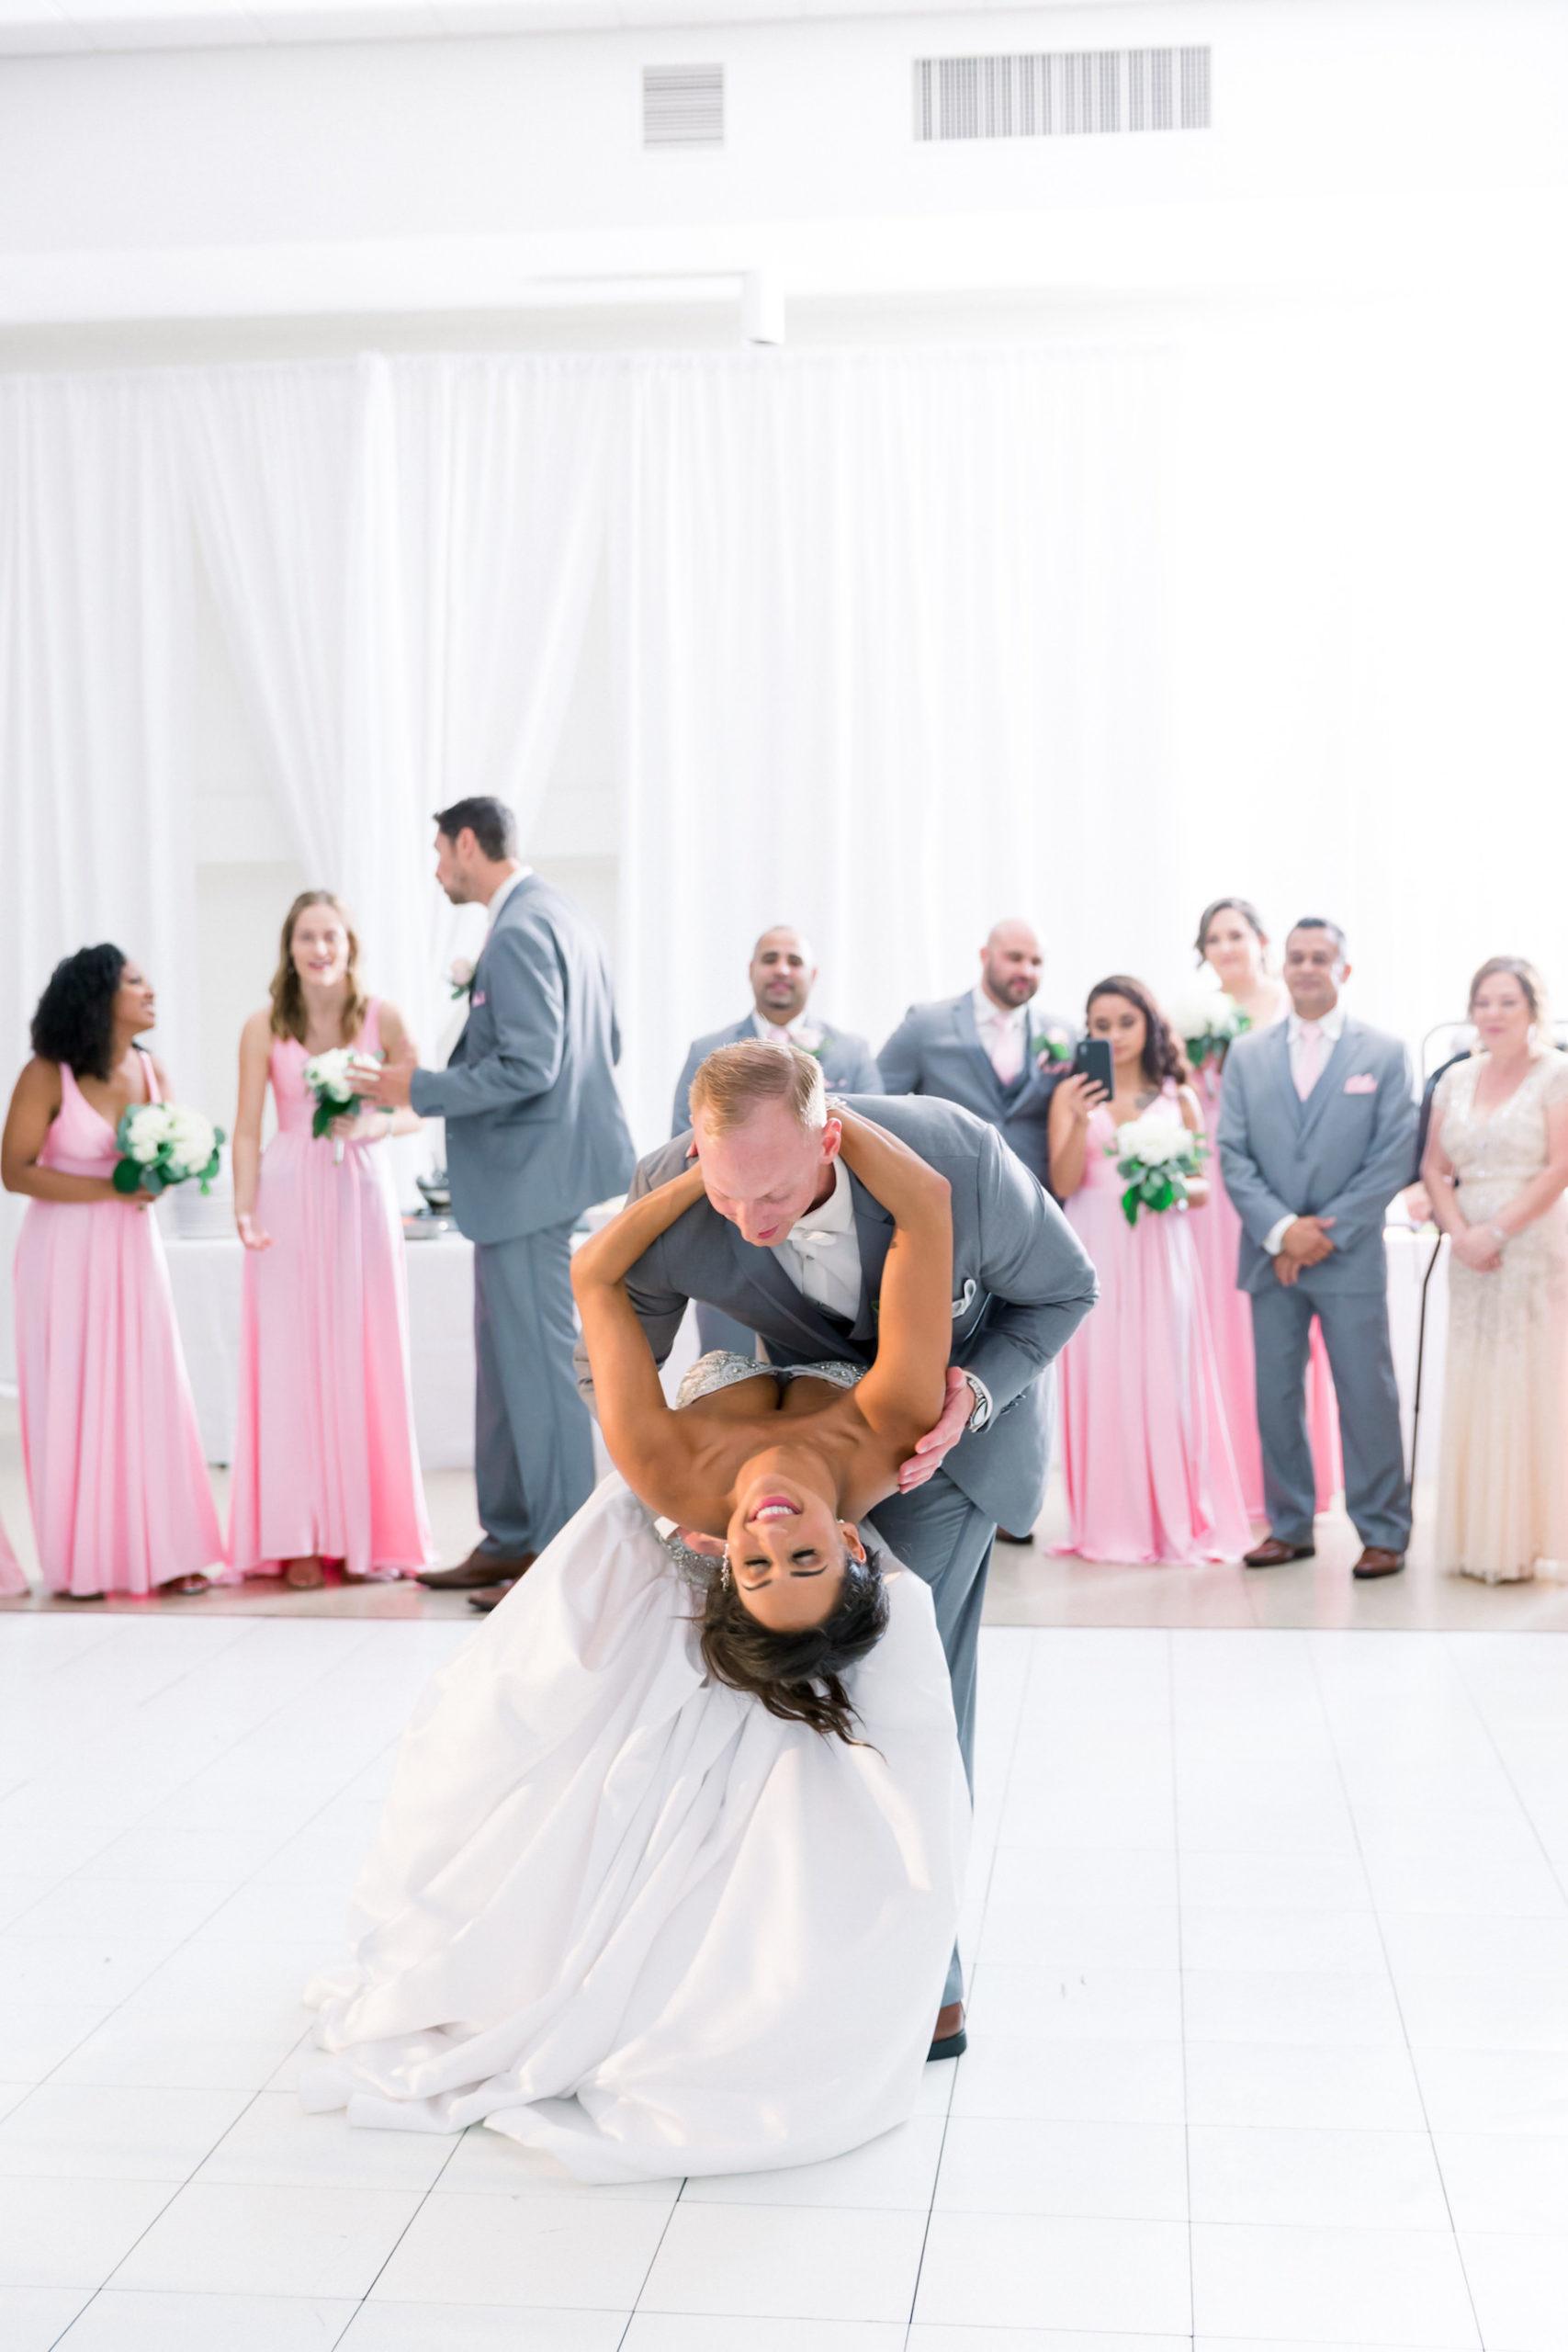 Fun Bride and Groom First Dance Dip Wedding Reception Portrait | Wedding Venue Tampa Garden Club | Wedding Photographer Shauna and Jordon Photography | Wedding Dress Truly Forever Bridal